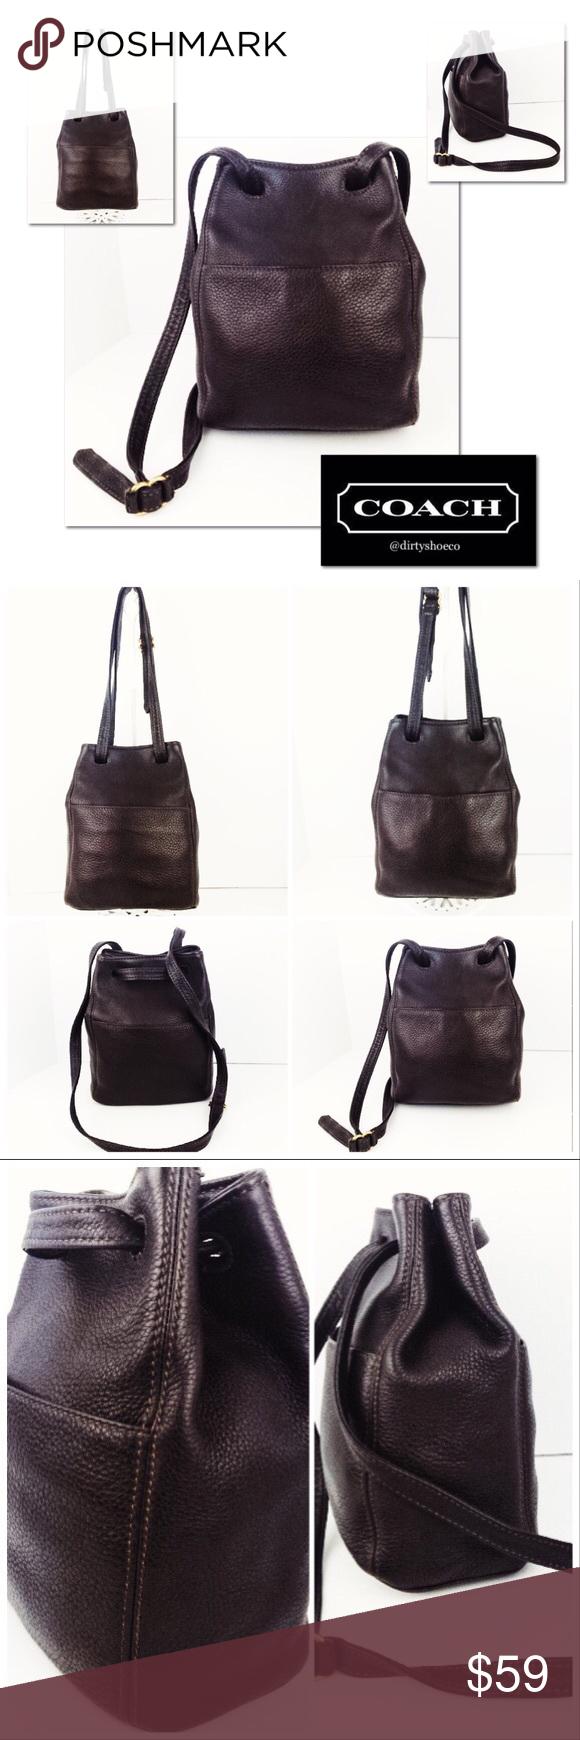 Spotted while shopping on Poshmark  🎁🎄Coach Sonoma Convertible Hobo  Crossbody Bag!  poshmark  fashion  shopping  style  Coach  Handbags bd76cebe72